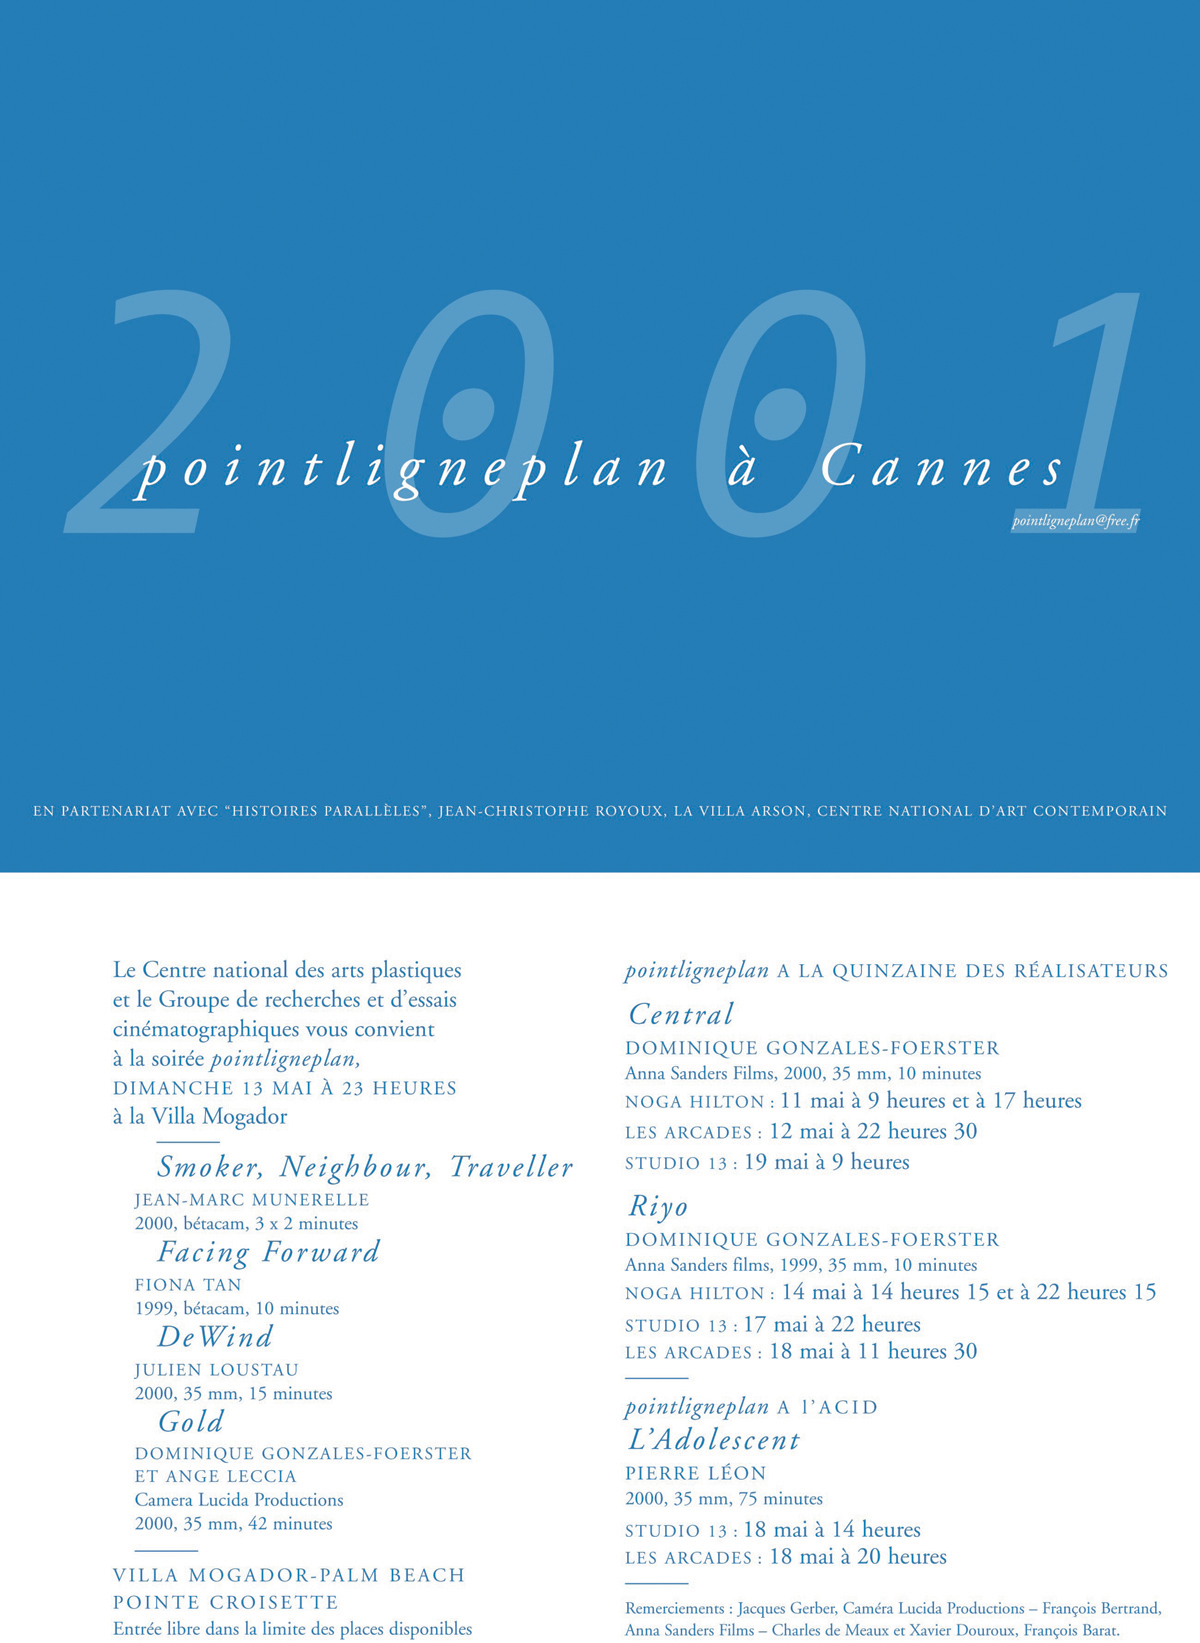 Pointligneplan à Cannes 13 mai 2001